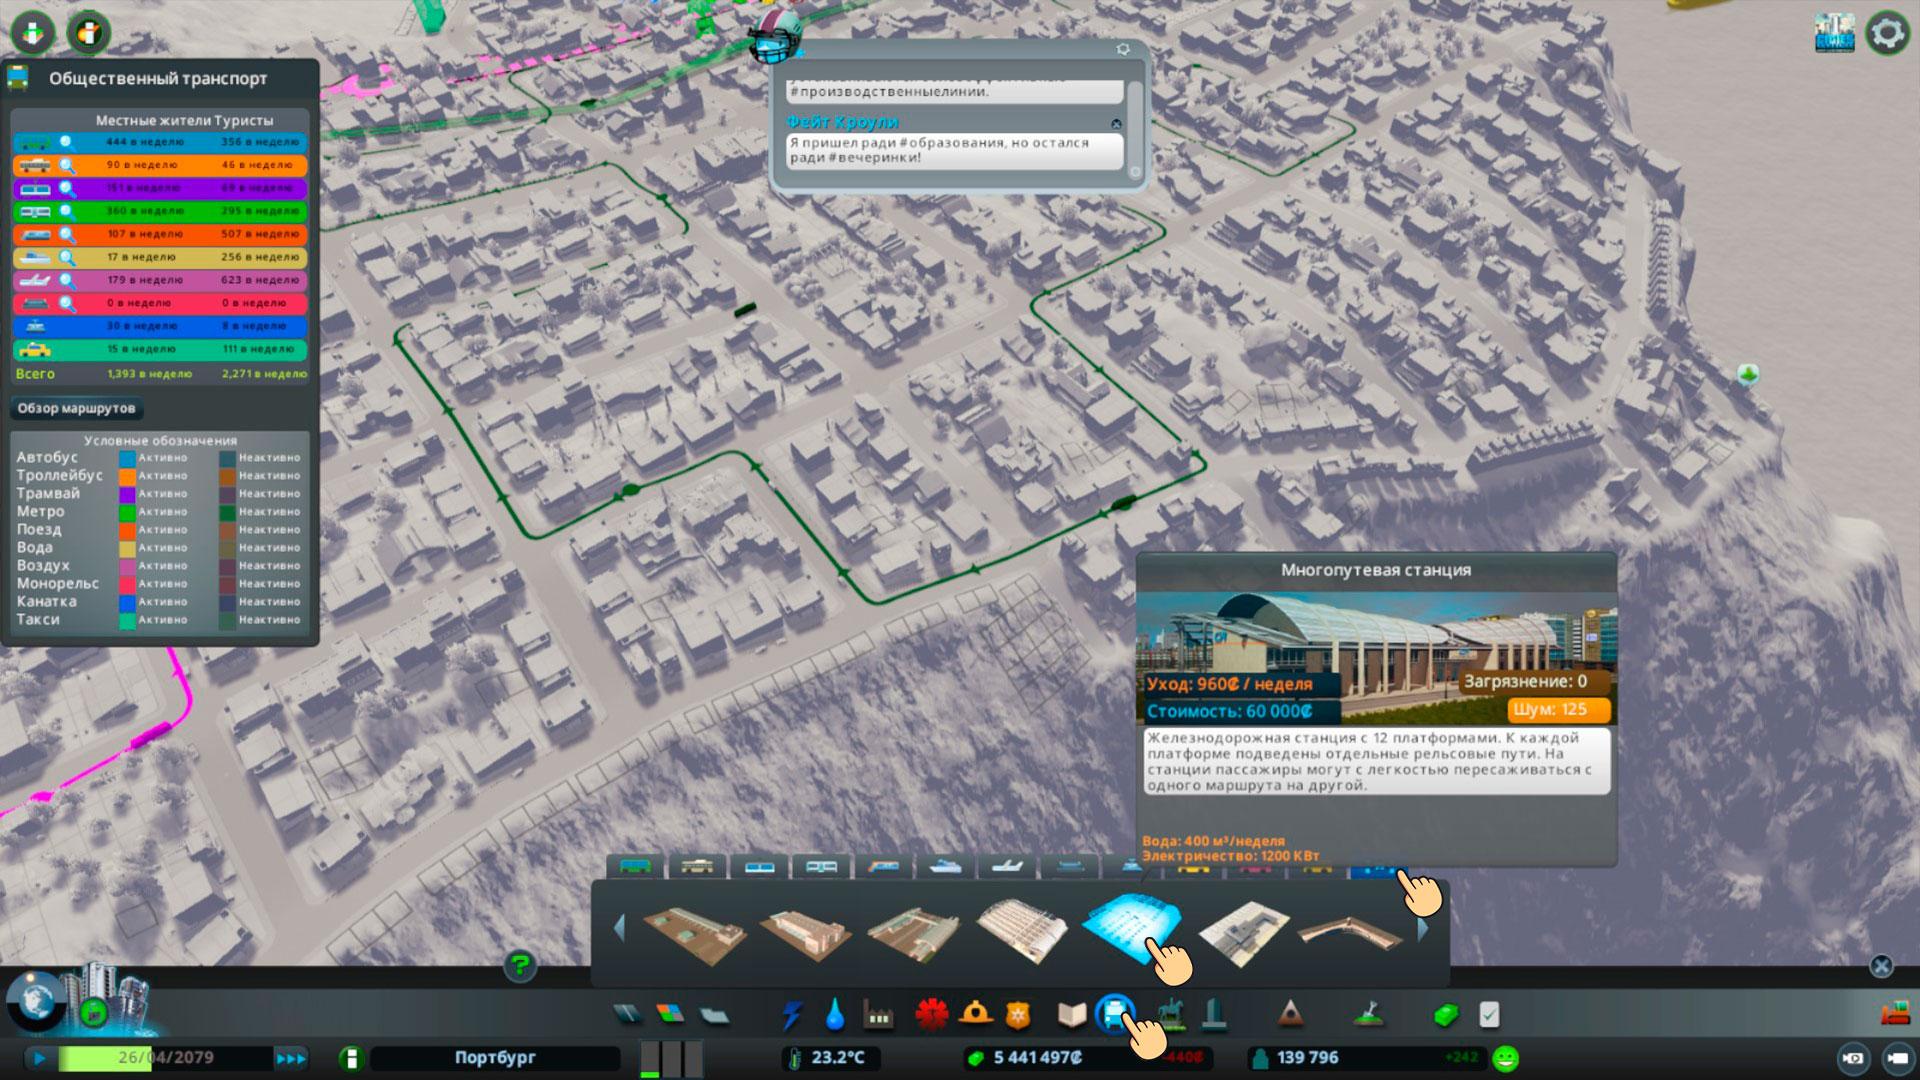 Многопутевая станция cities skylines